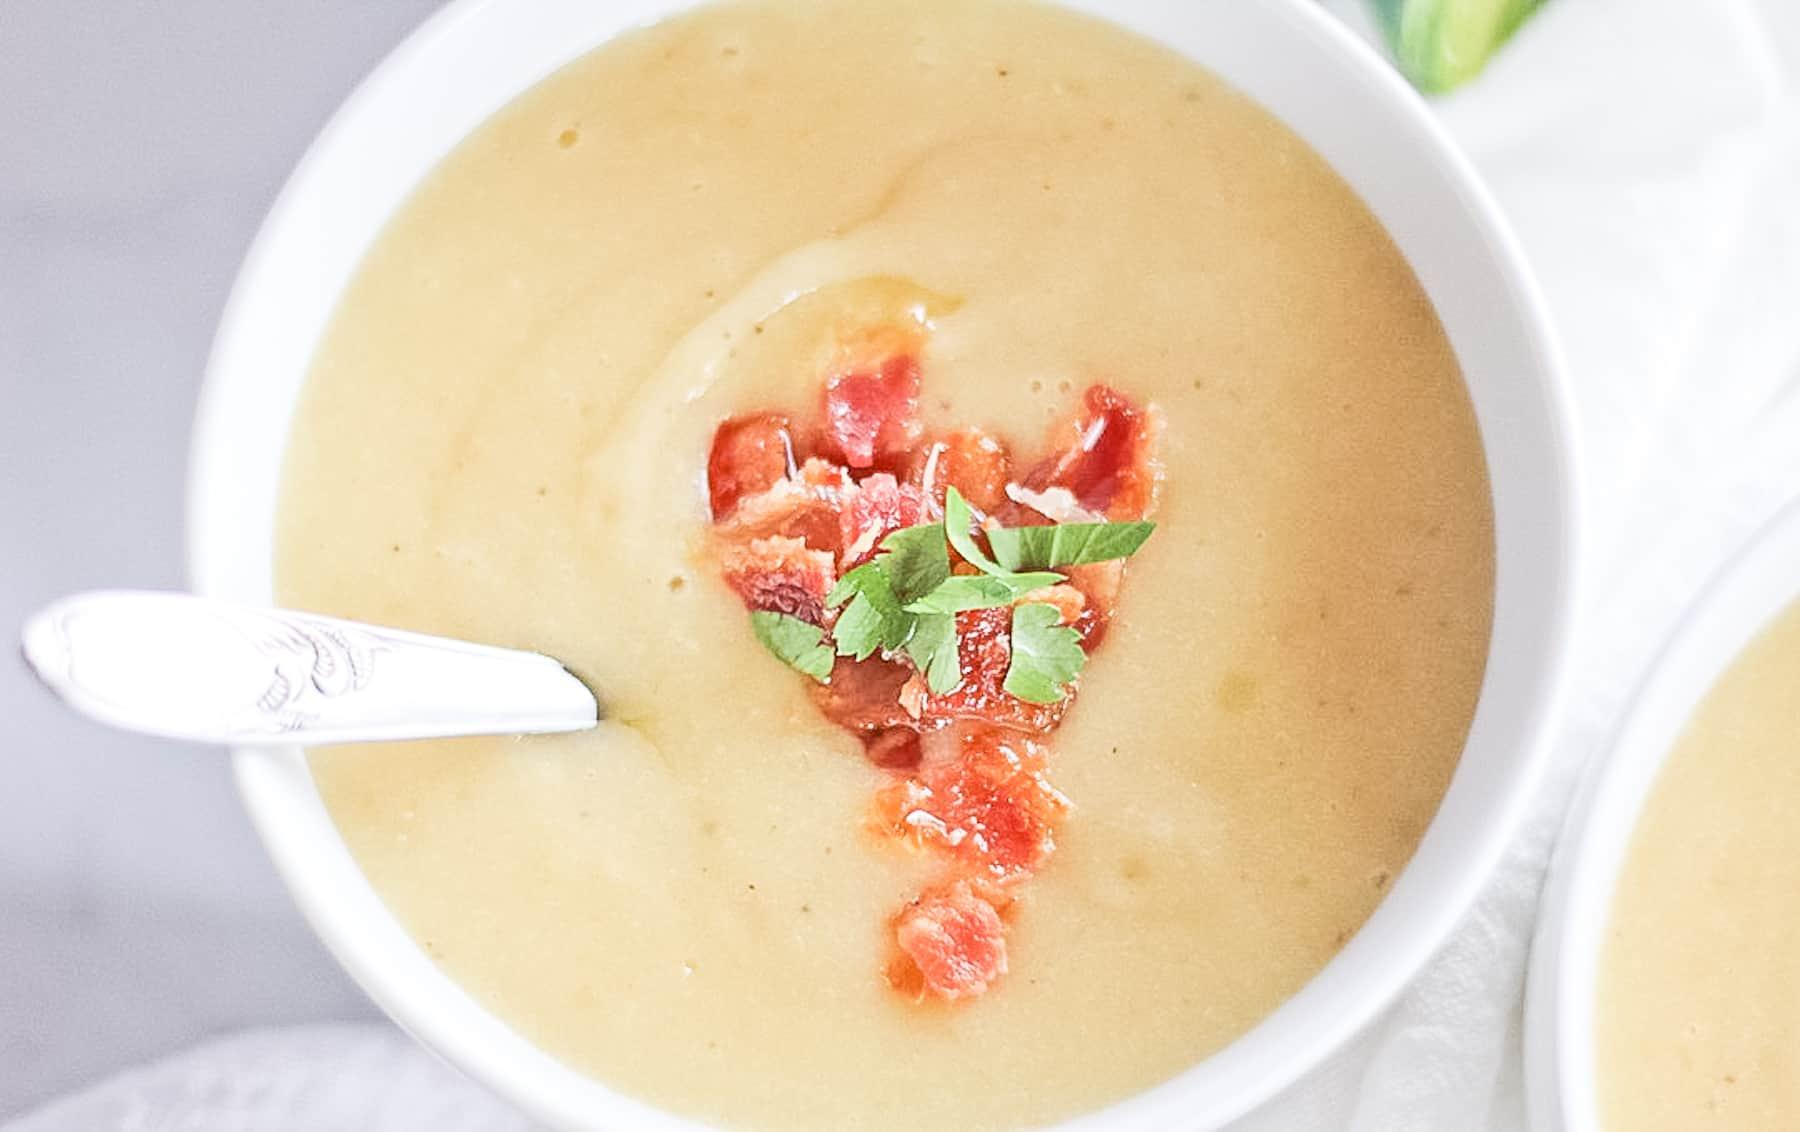 A close up of potato soup with bacon.